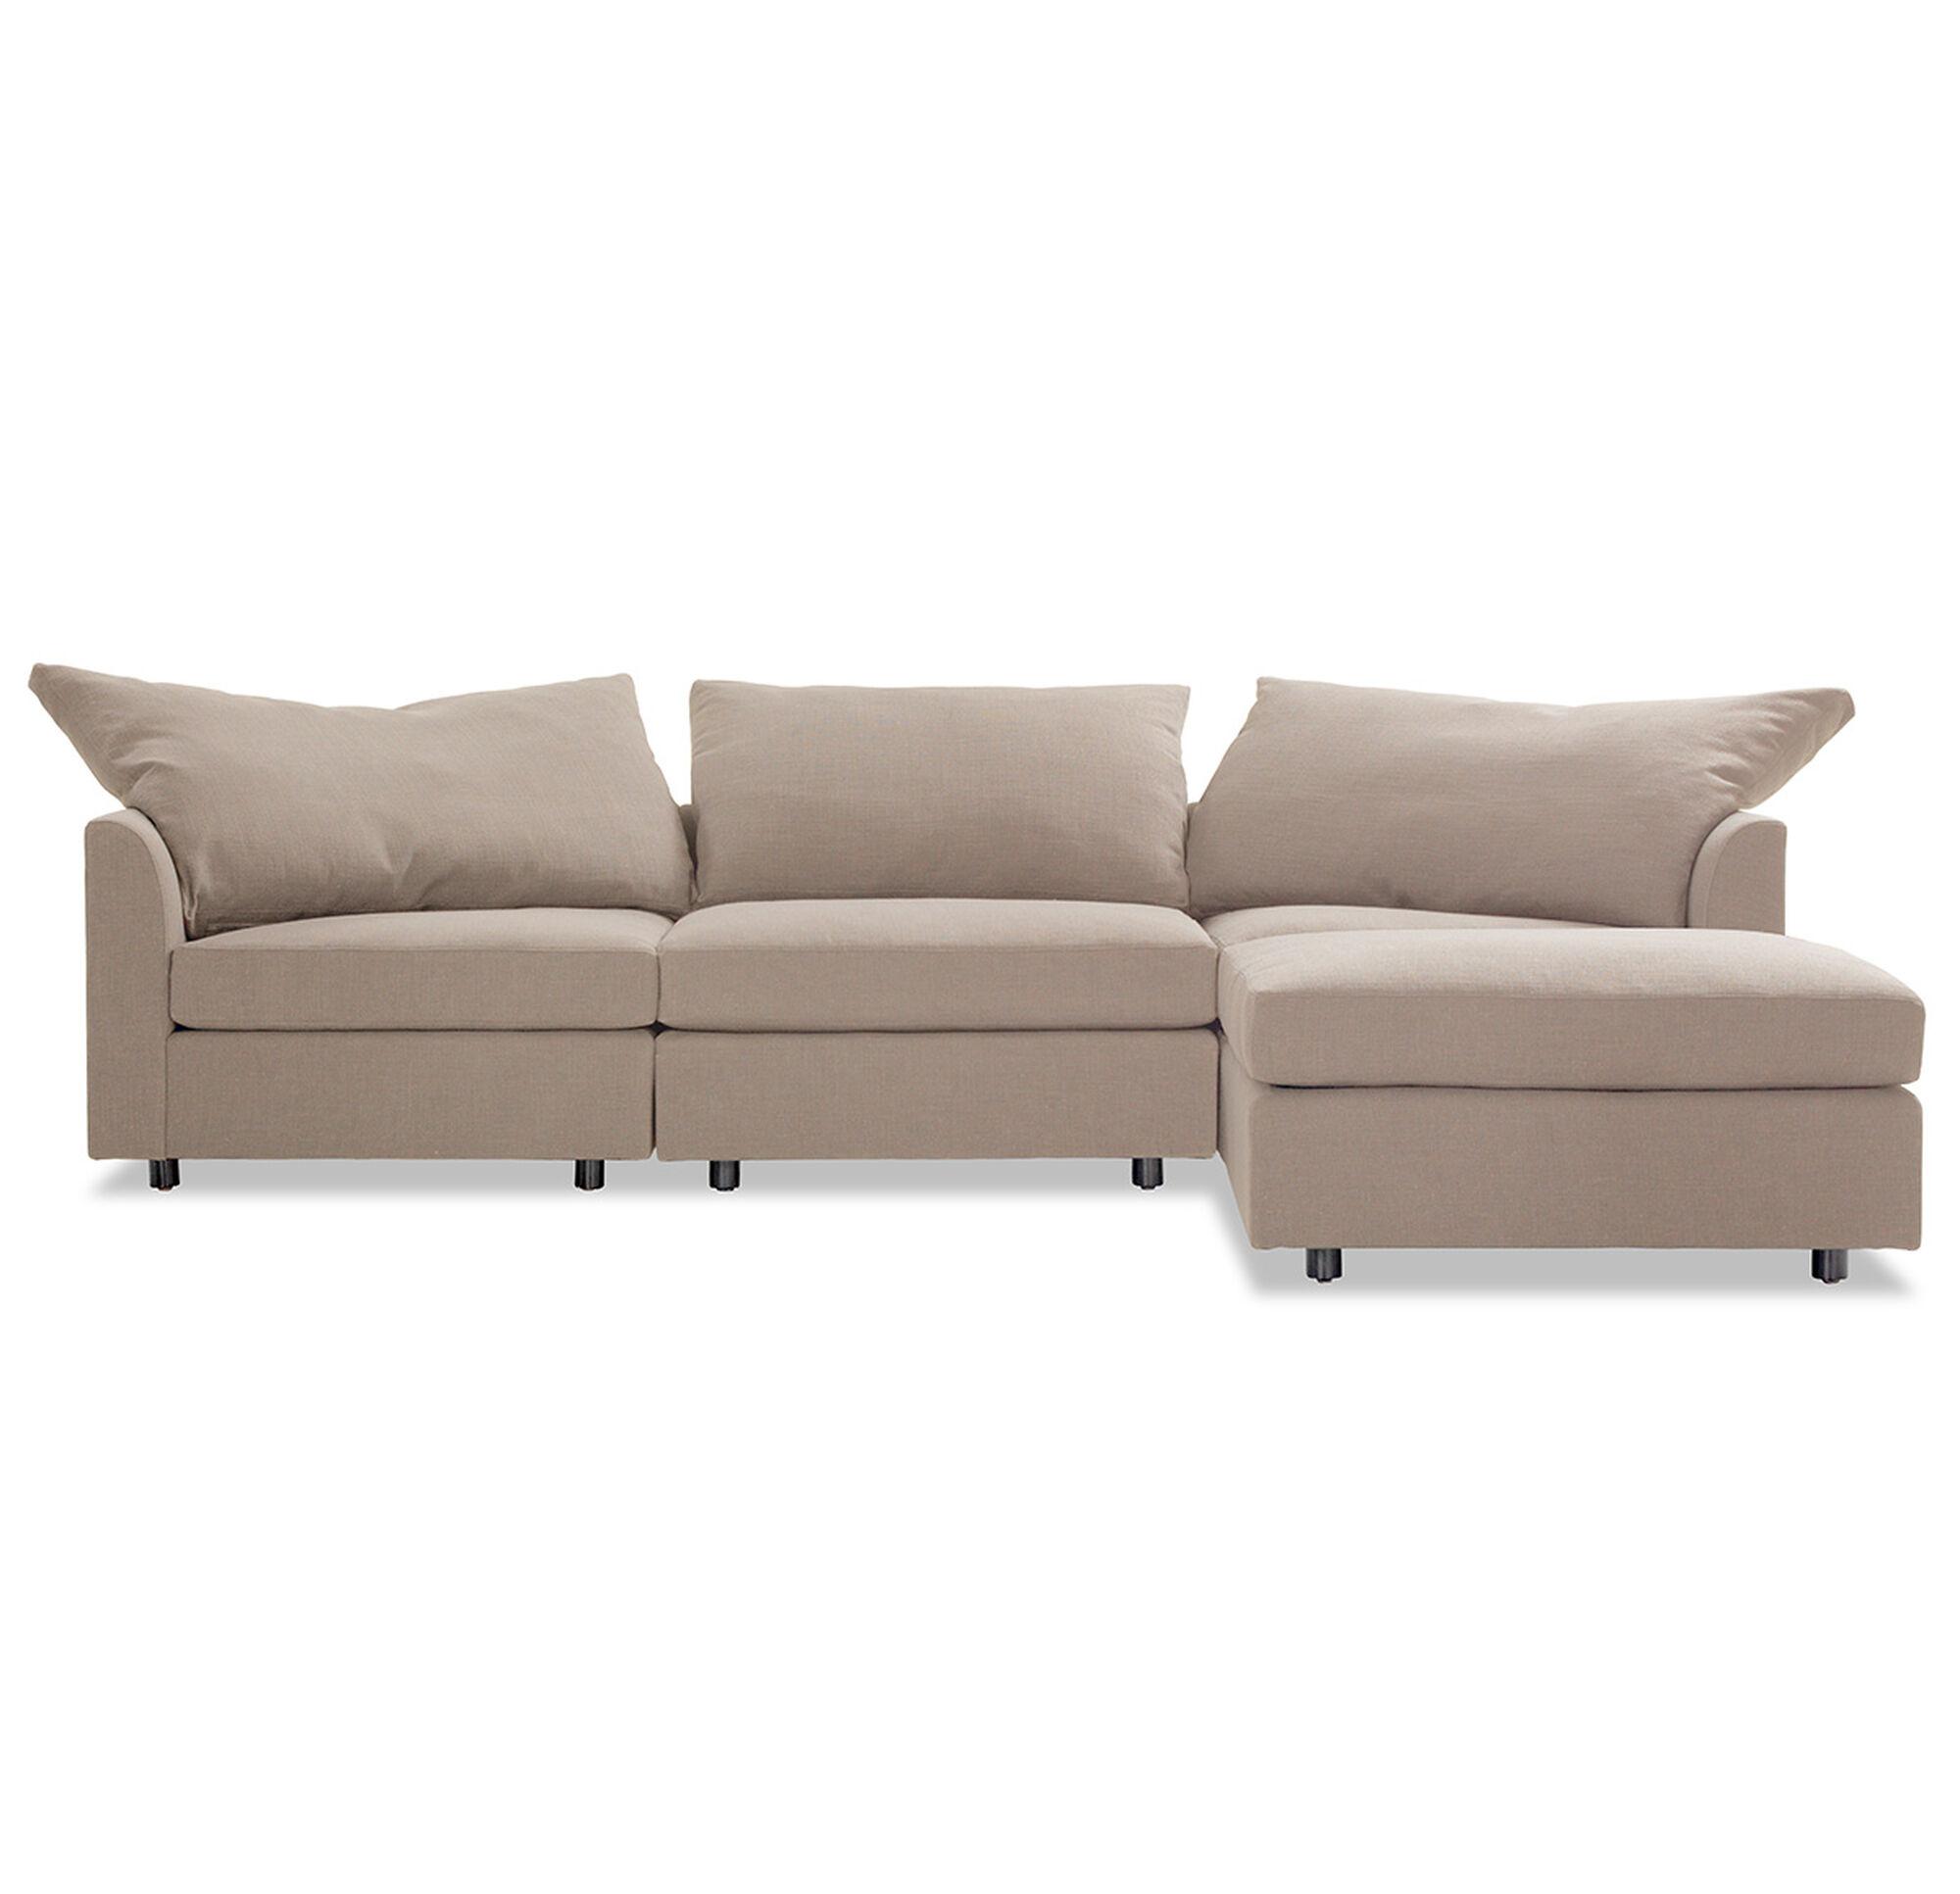 Big easy sectional sofa for Sectional sofa hawaii